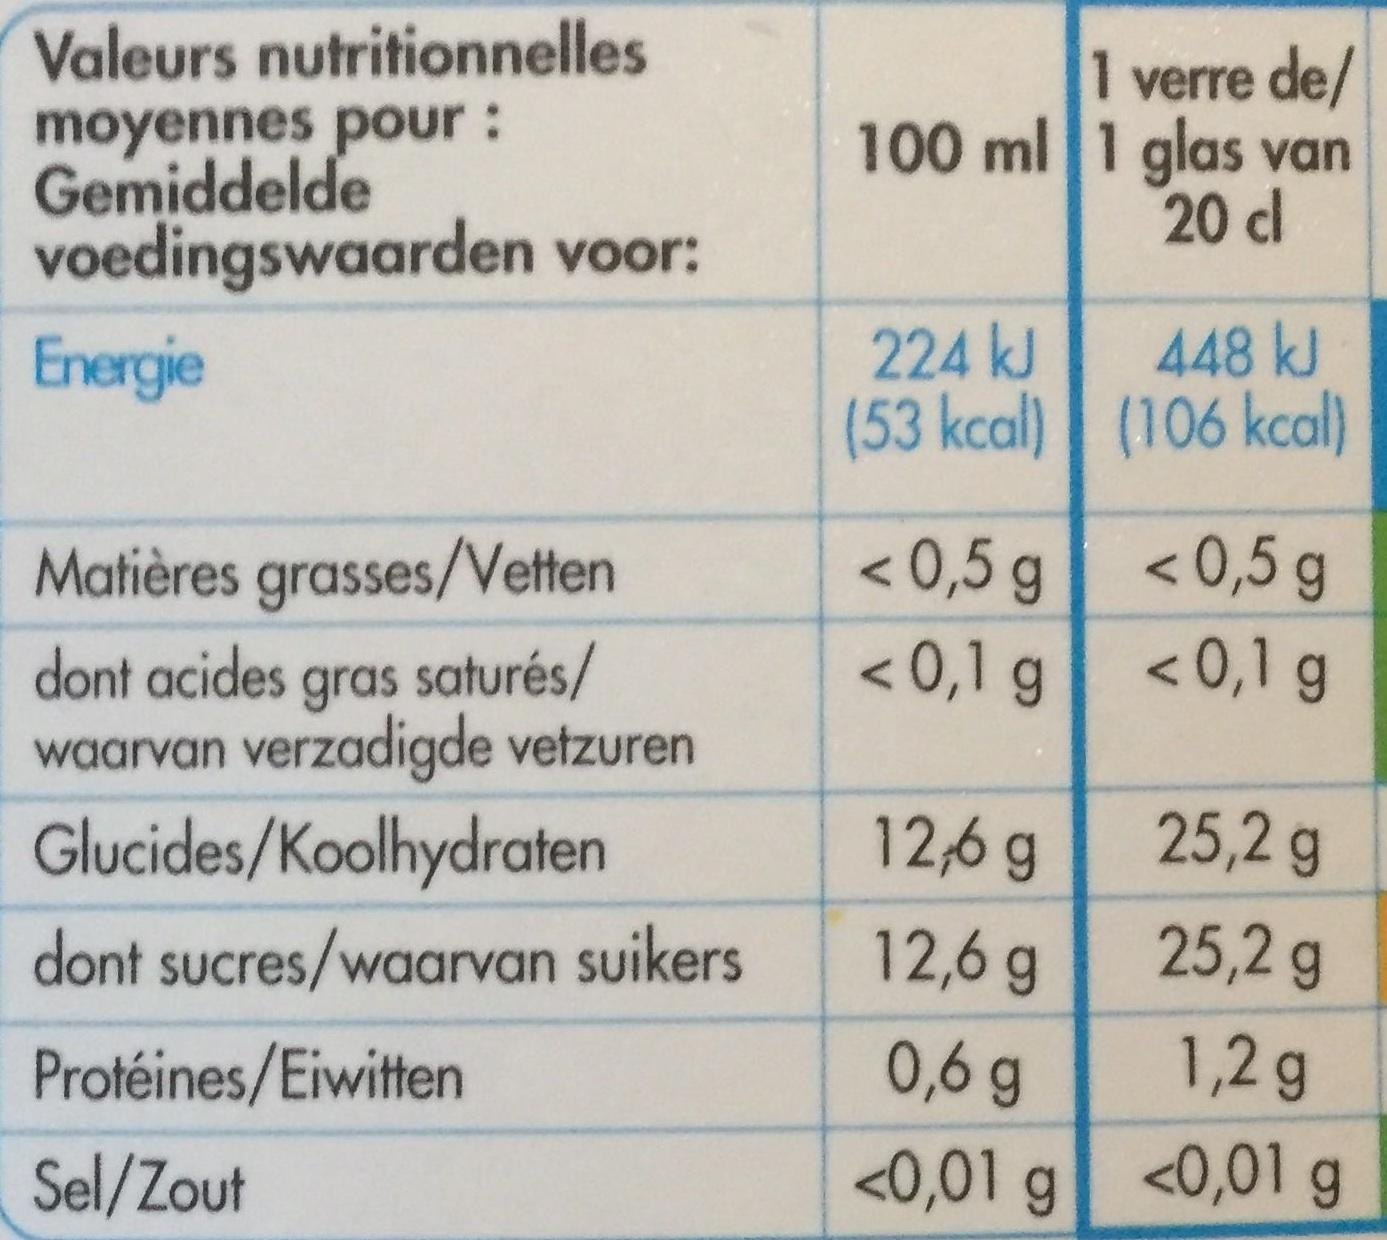 Jus d'orange pulpé - Voedingswaarden - fr